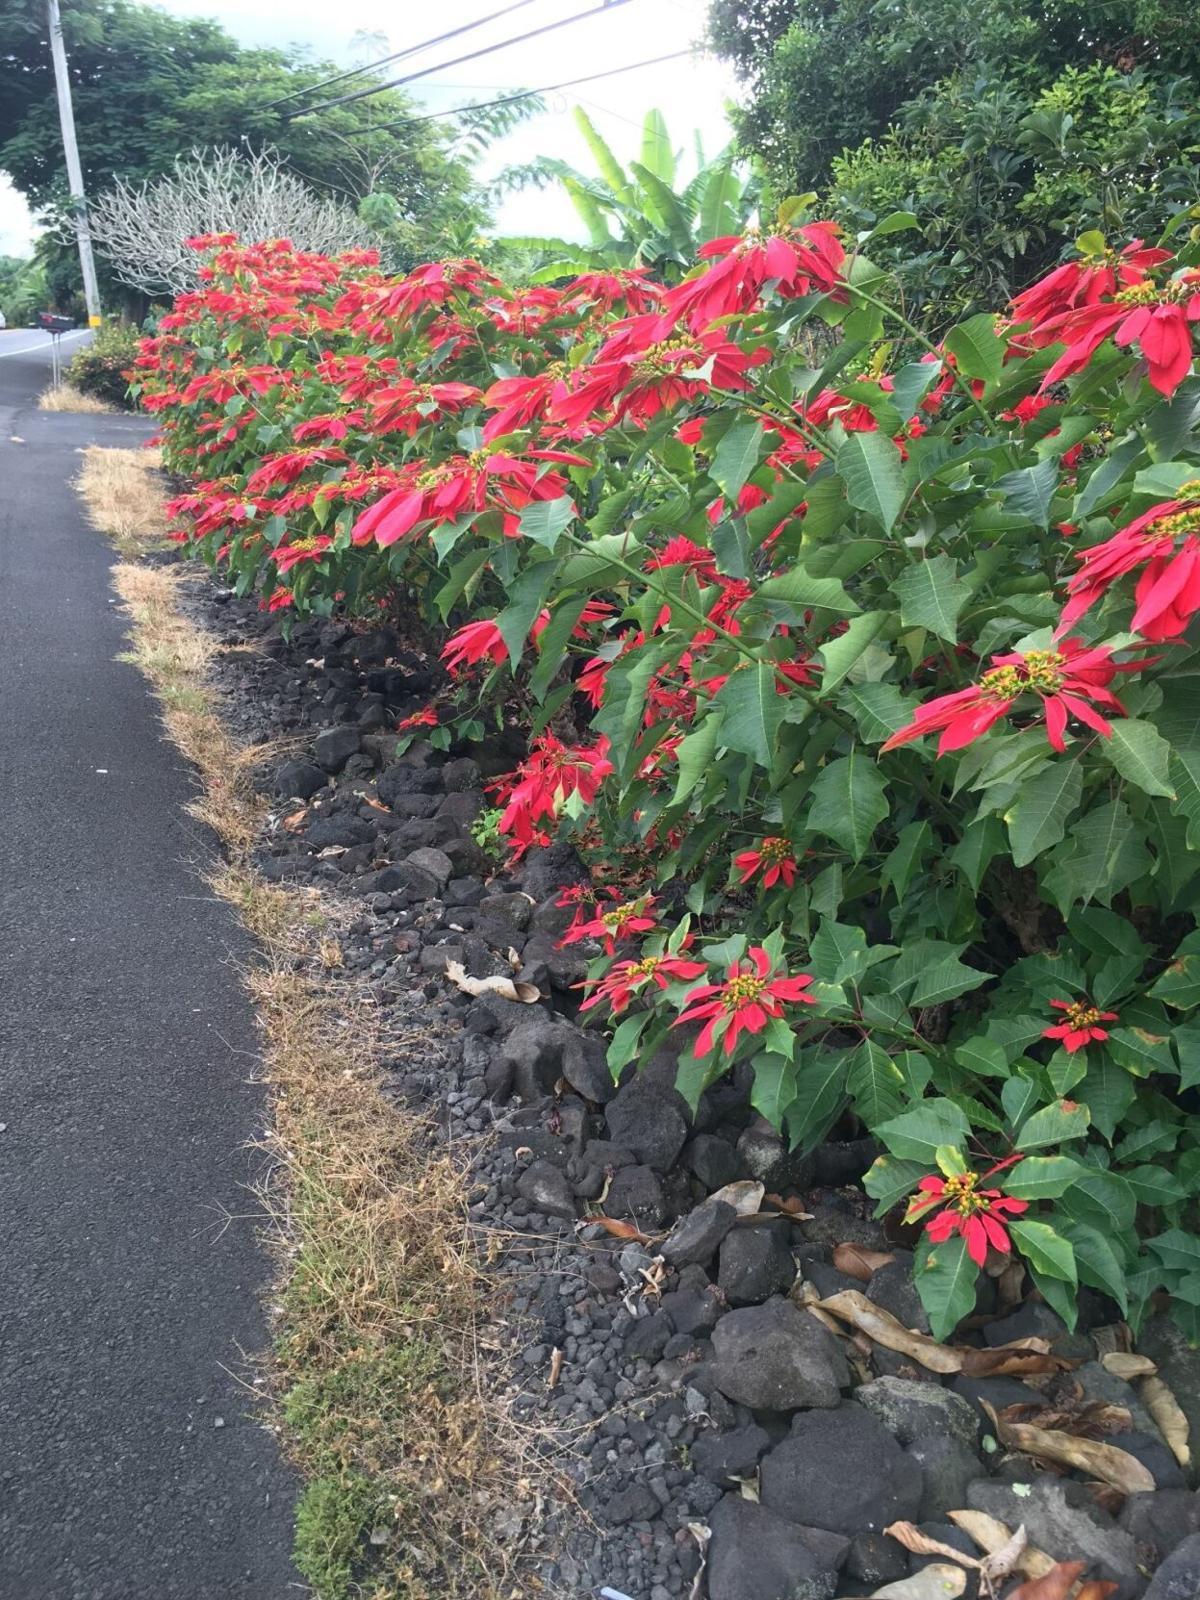 Wild poinsettias grow in Hawaii